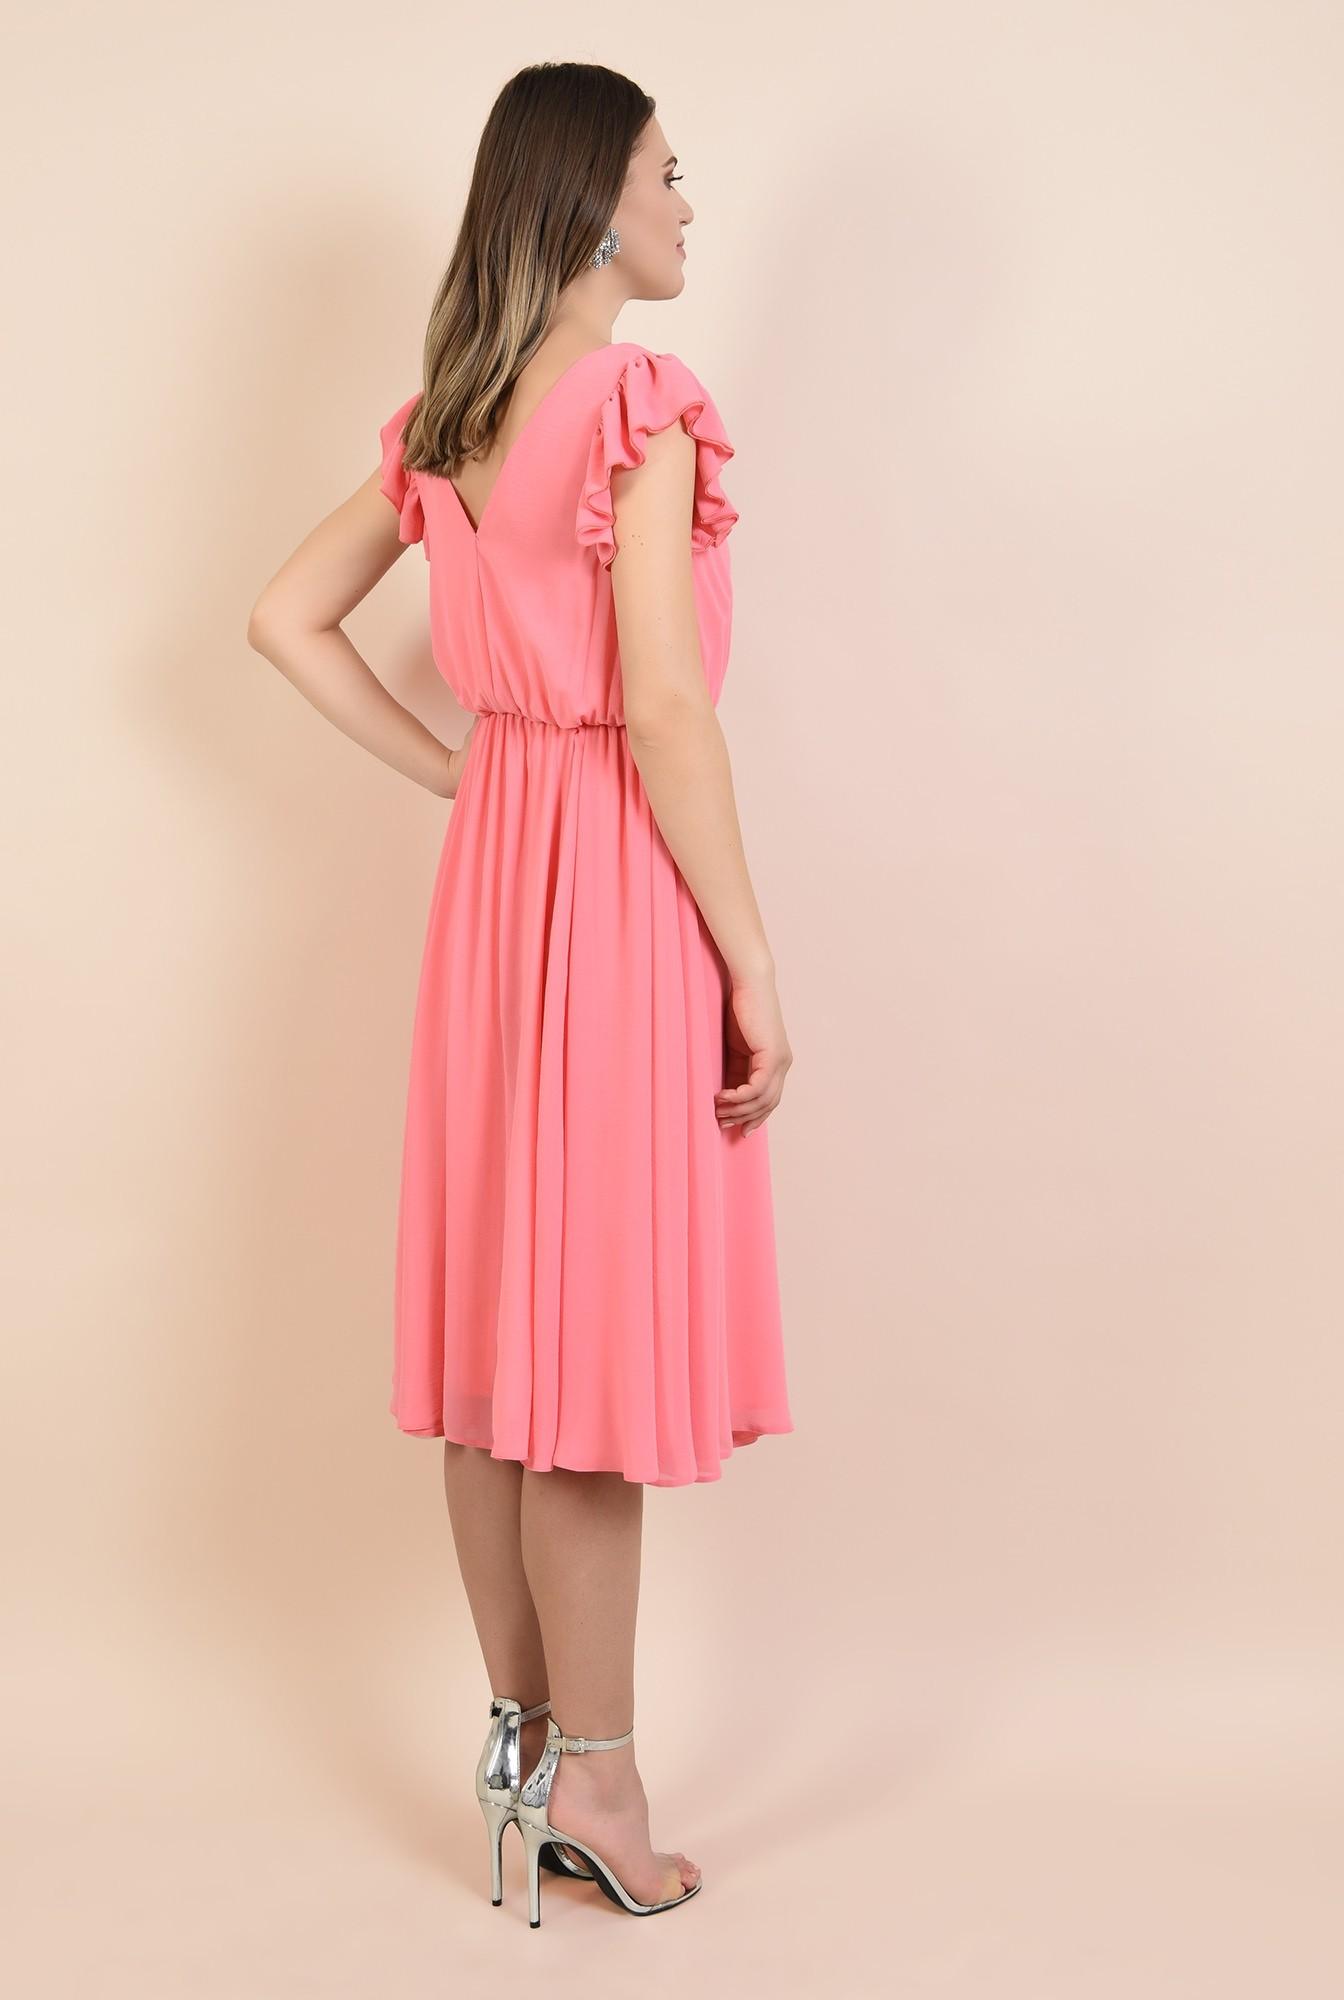 1 - rochie din voal, eleganta, roz, maneci volan, anchior, Poema